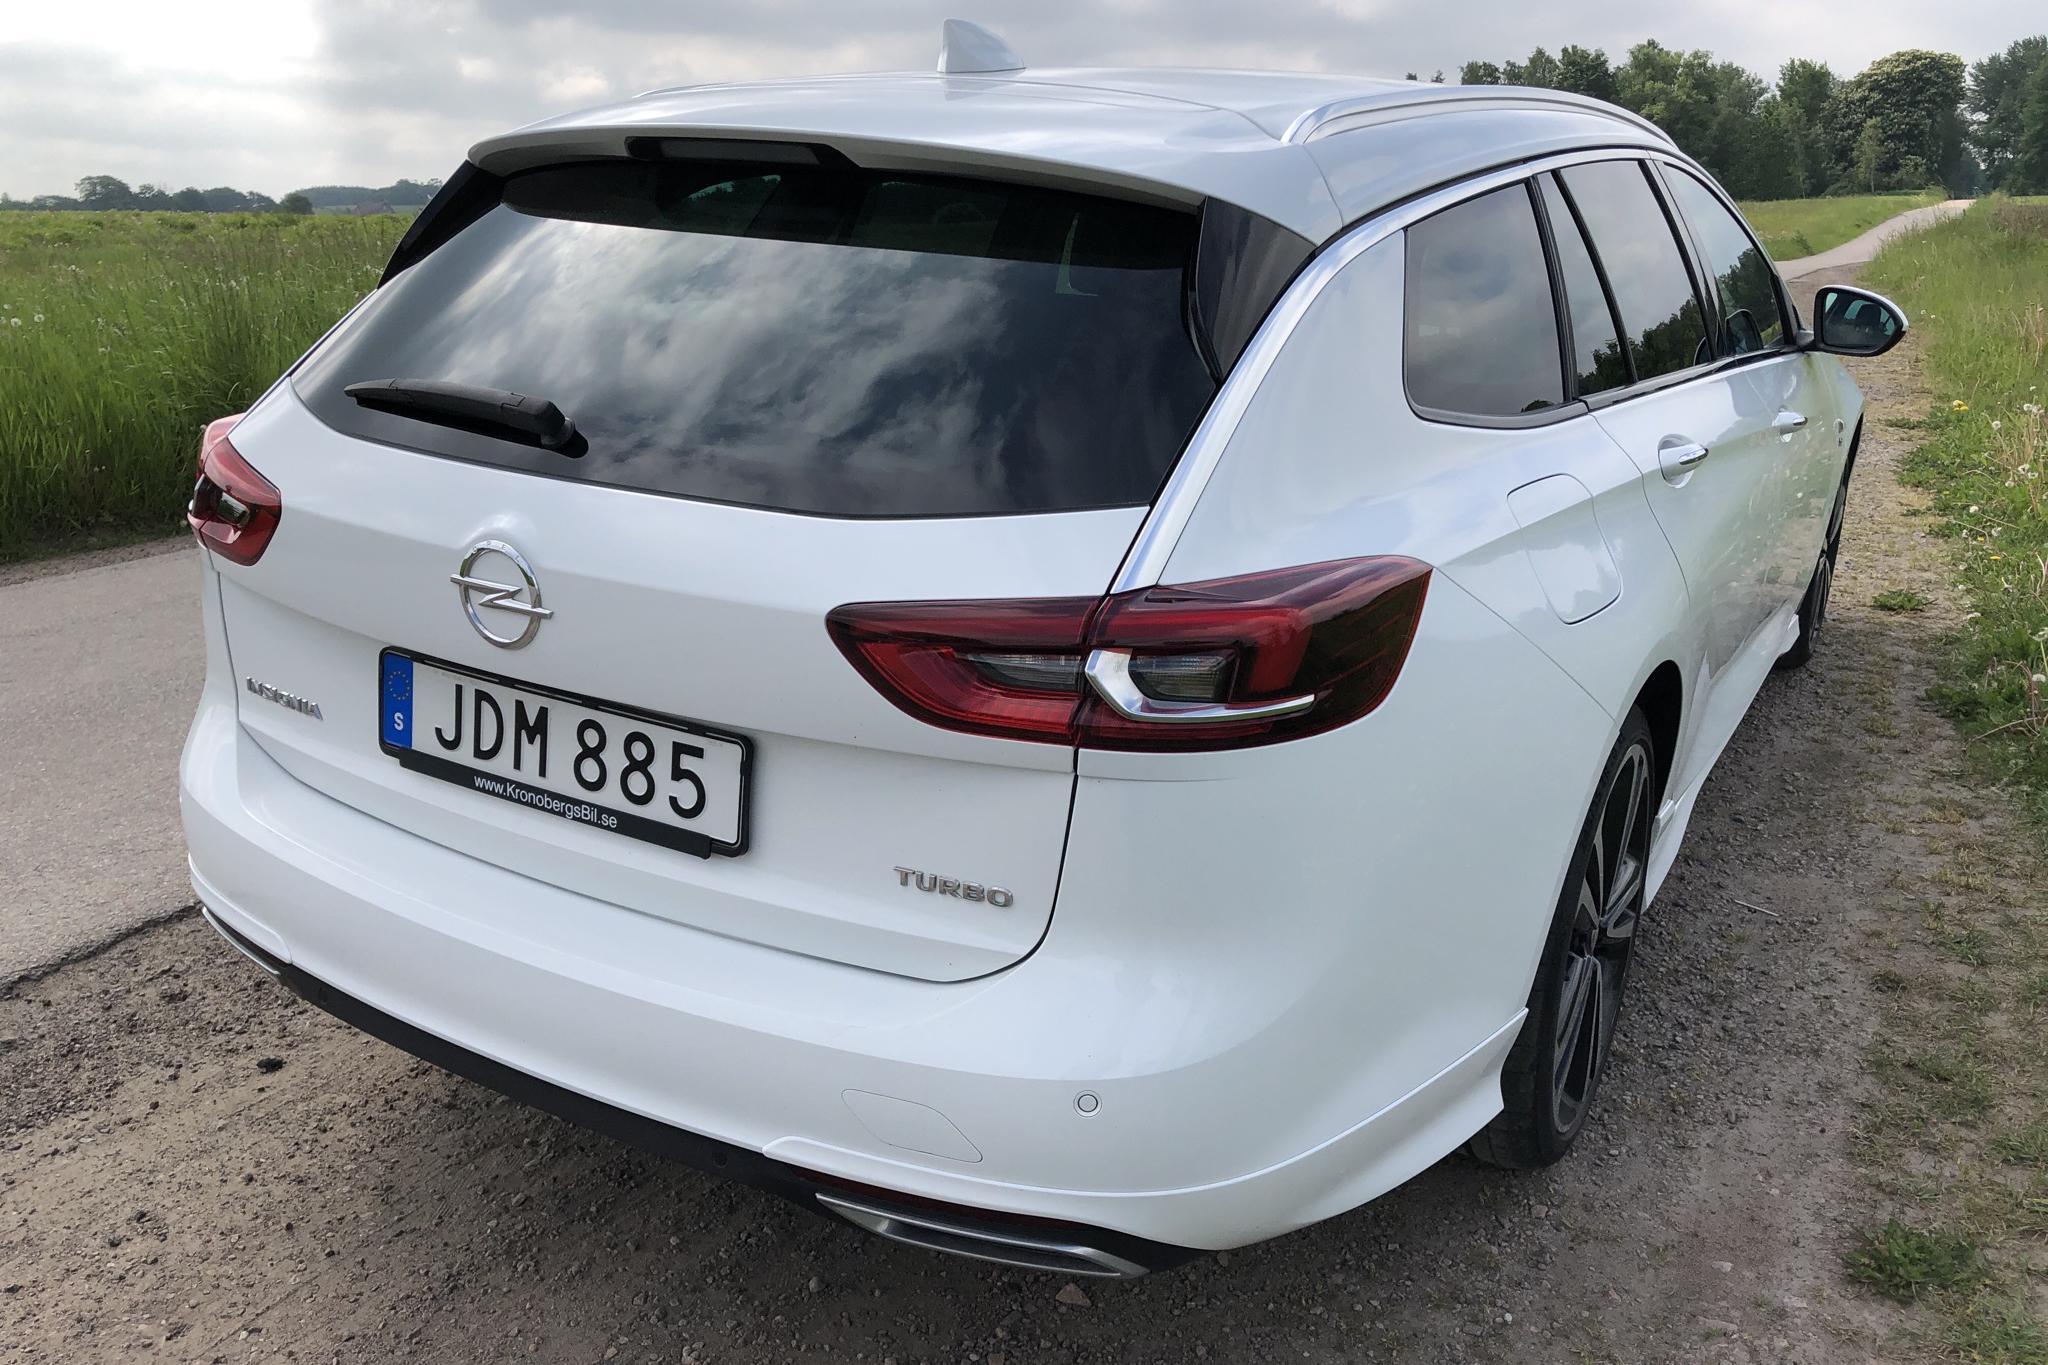 Opel Insignia 1.5 Turbo Sports Tourer (165hk) - 42 270 km - Automatic - white - 2018